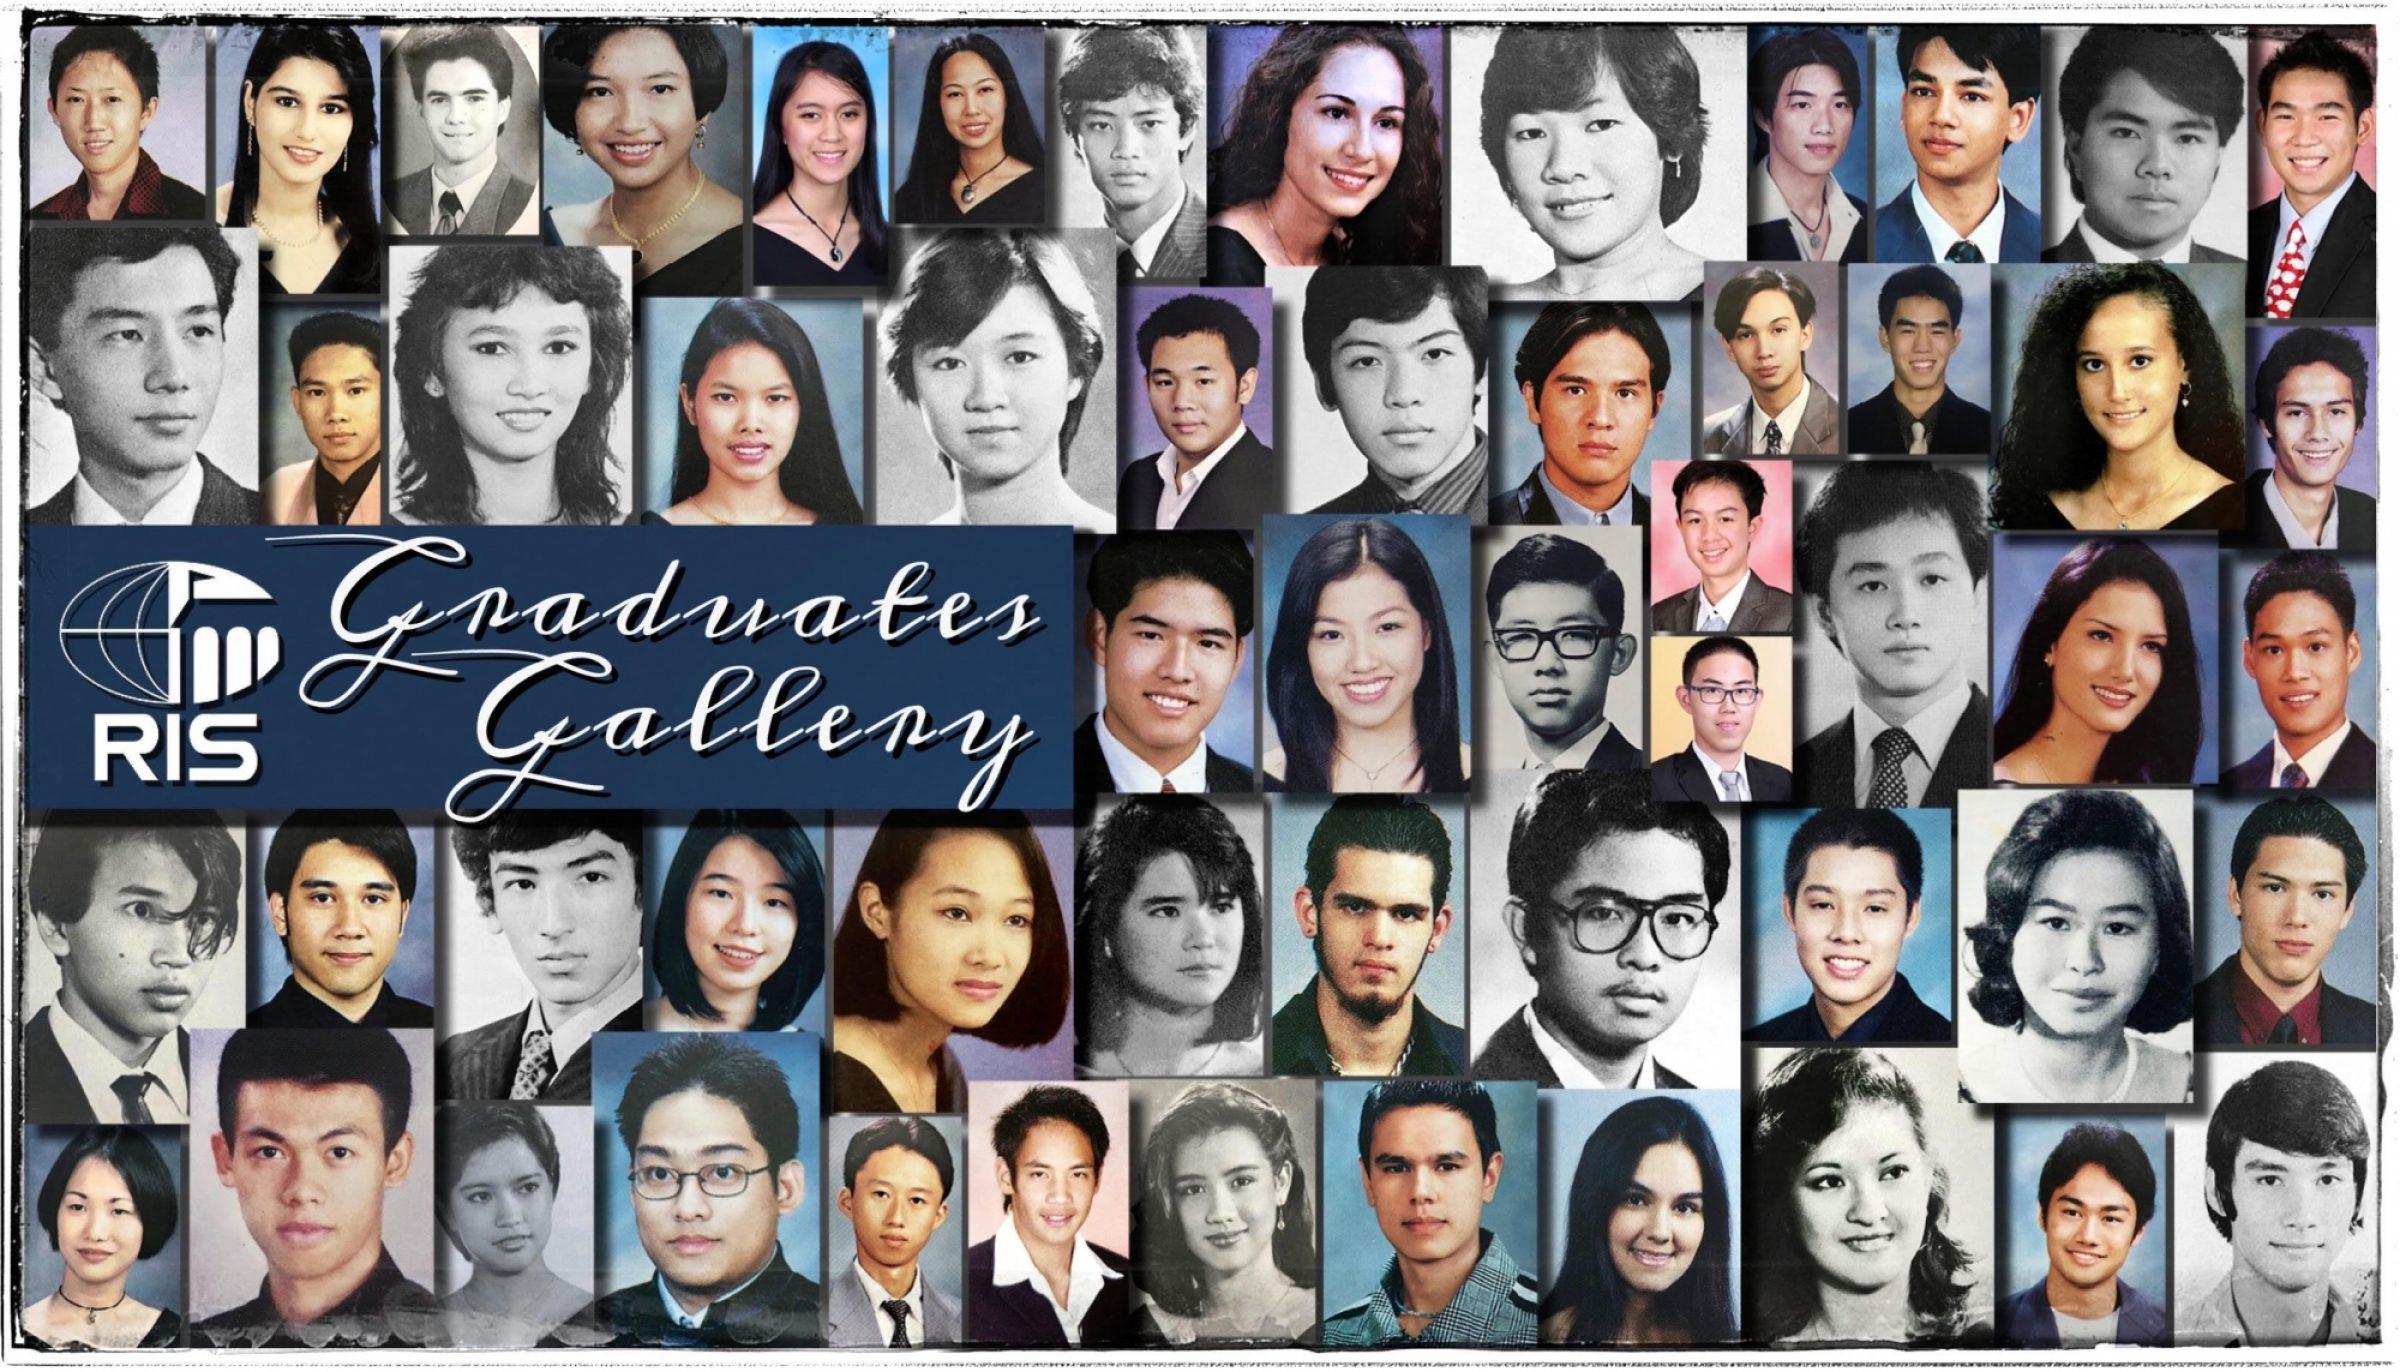 Graduates Gallery